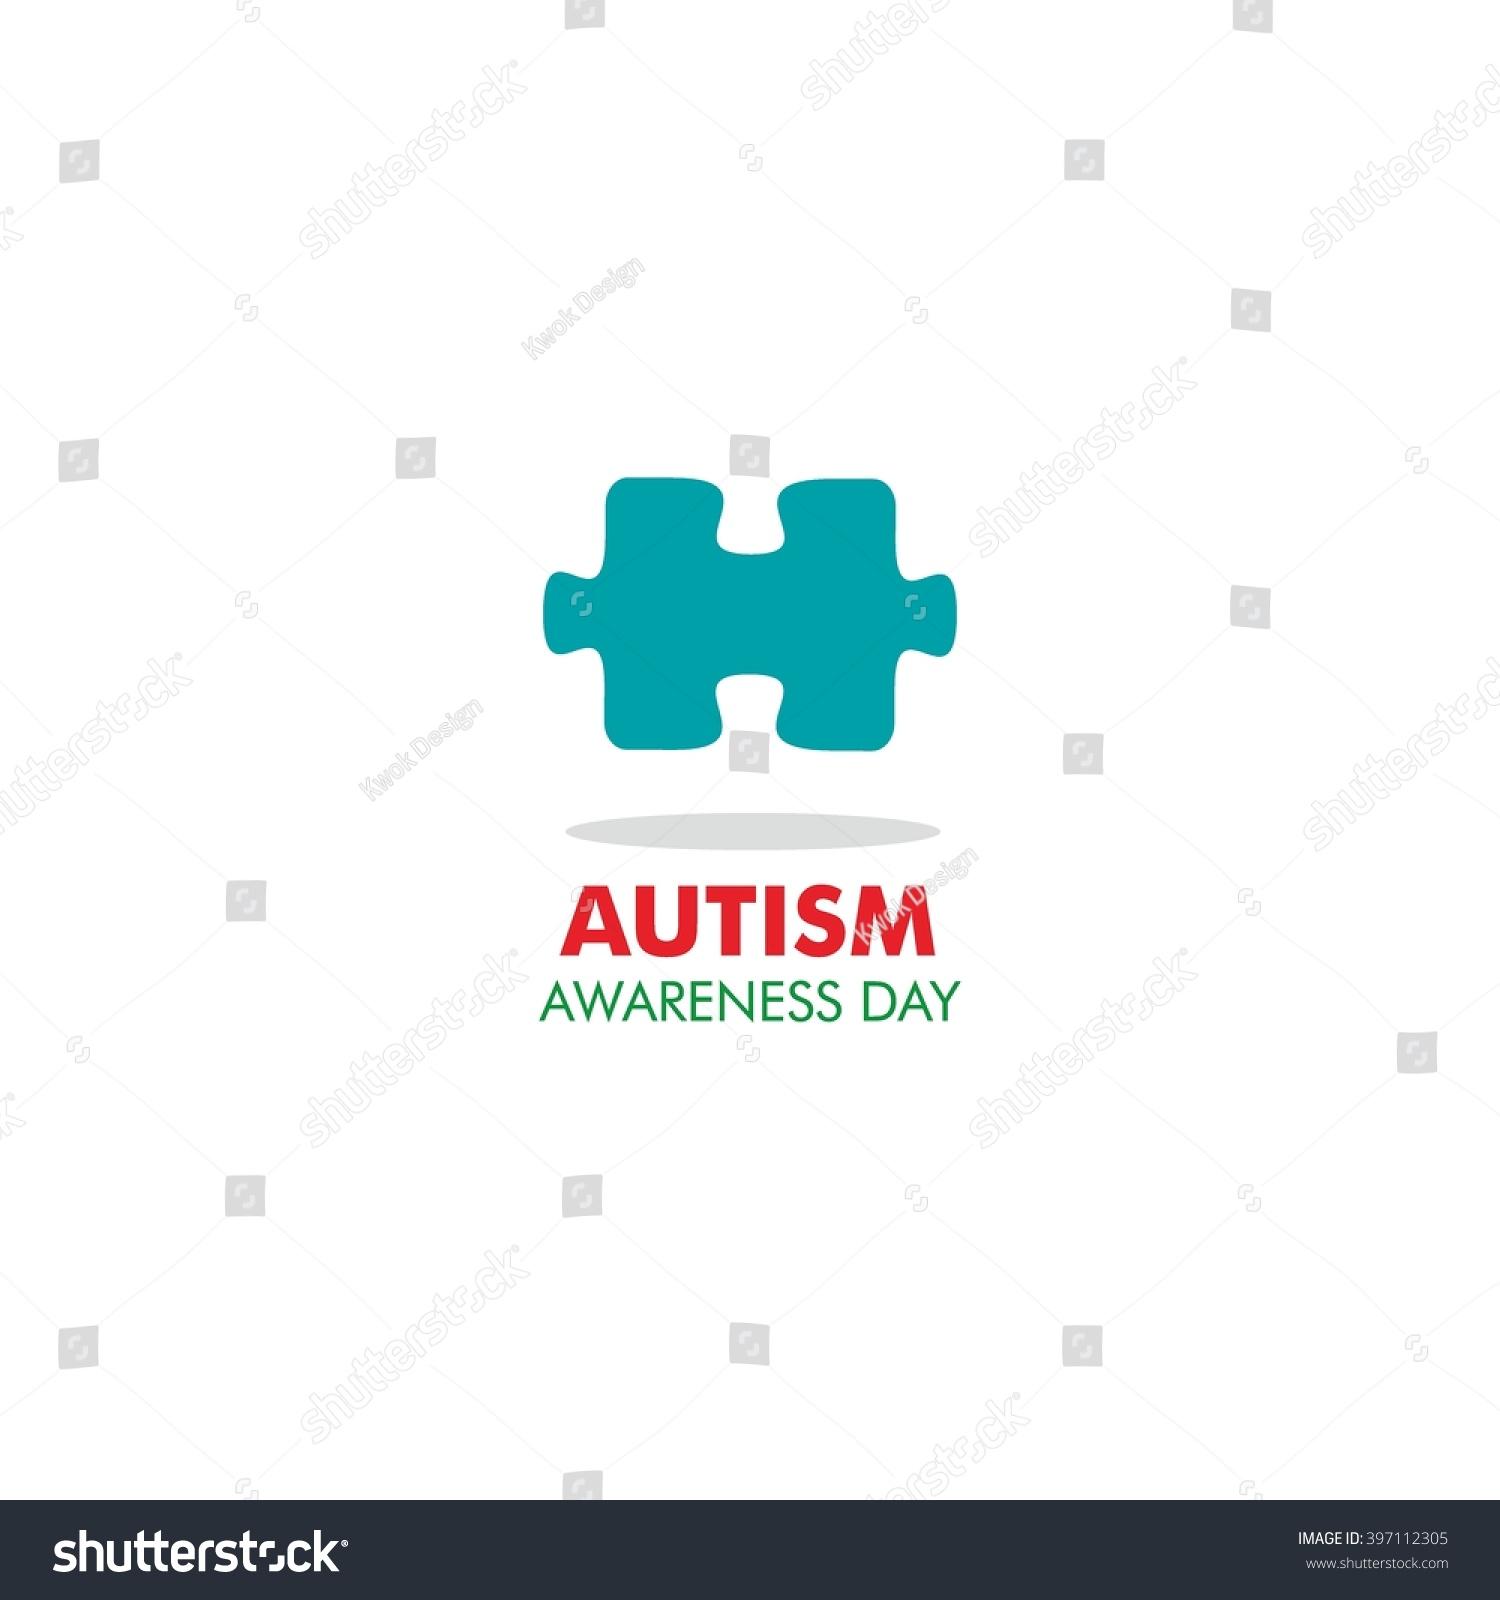 World autism awareness day logo design stock vector 397112305 world autism awareness day logo design template vector illustration colorful puzzles symbol biocorpaavc